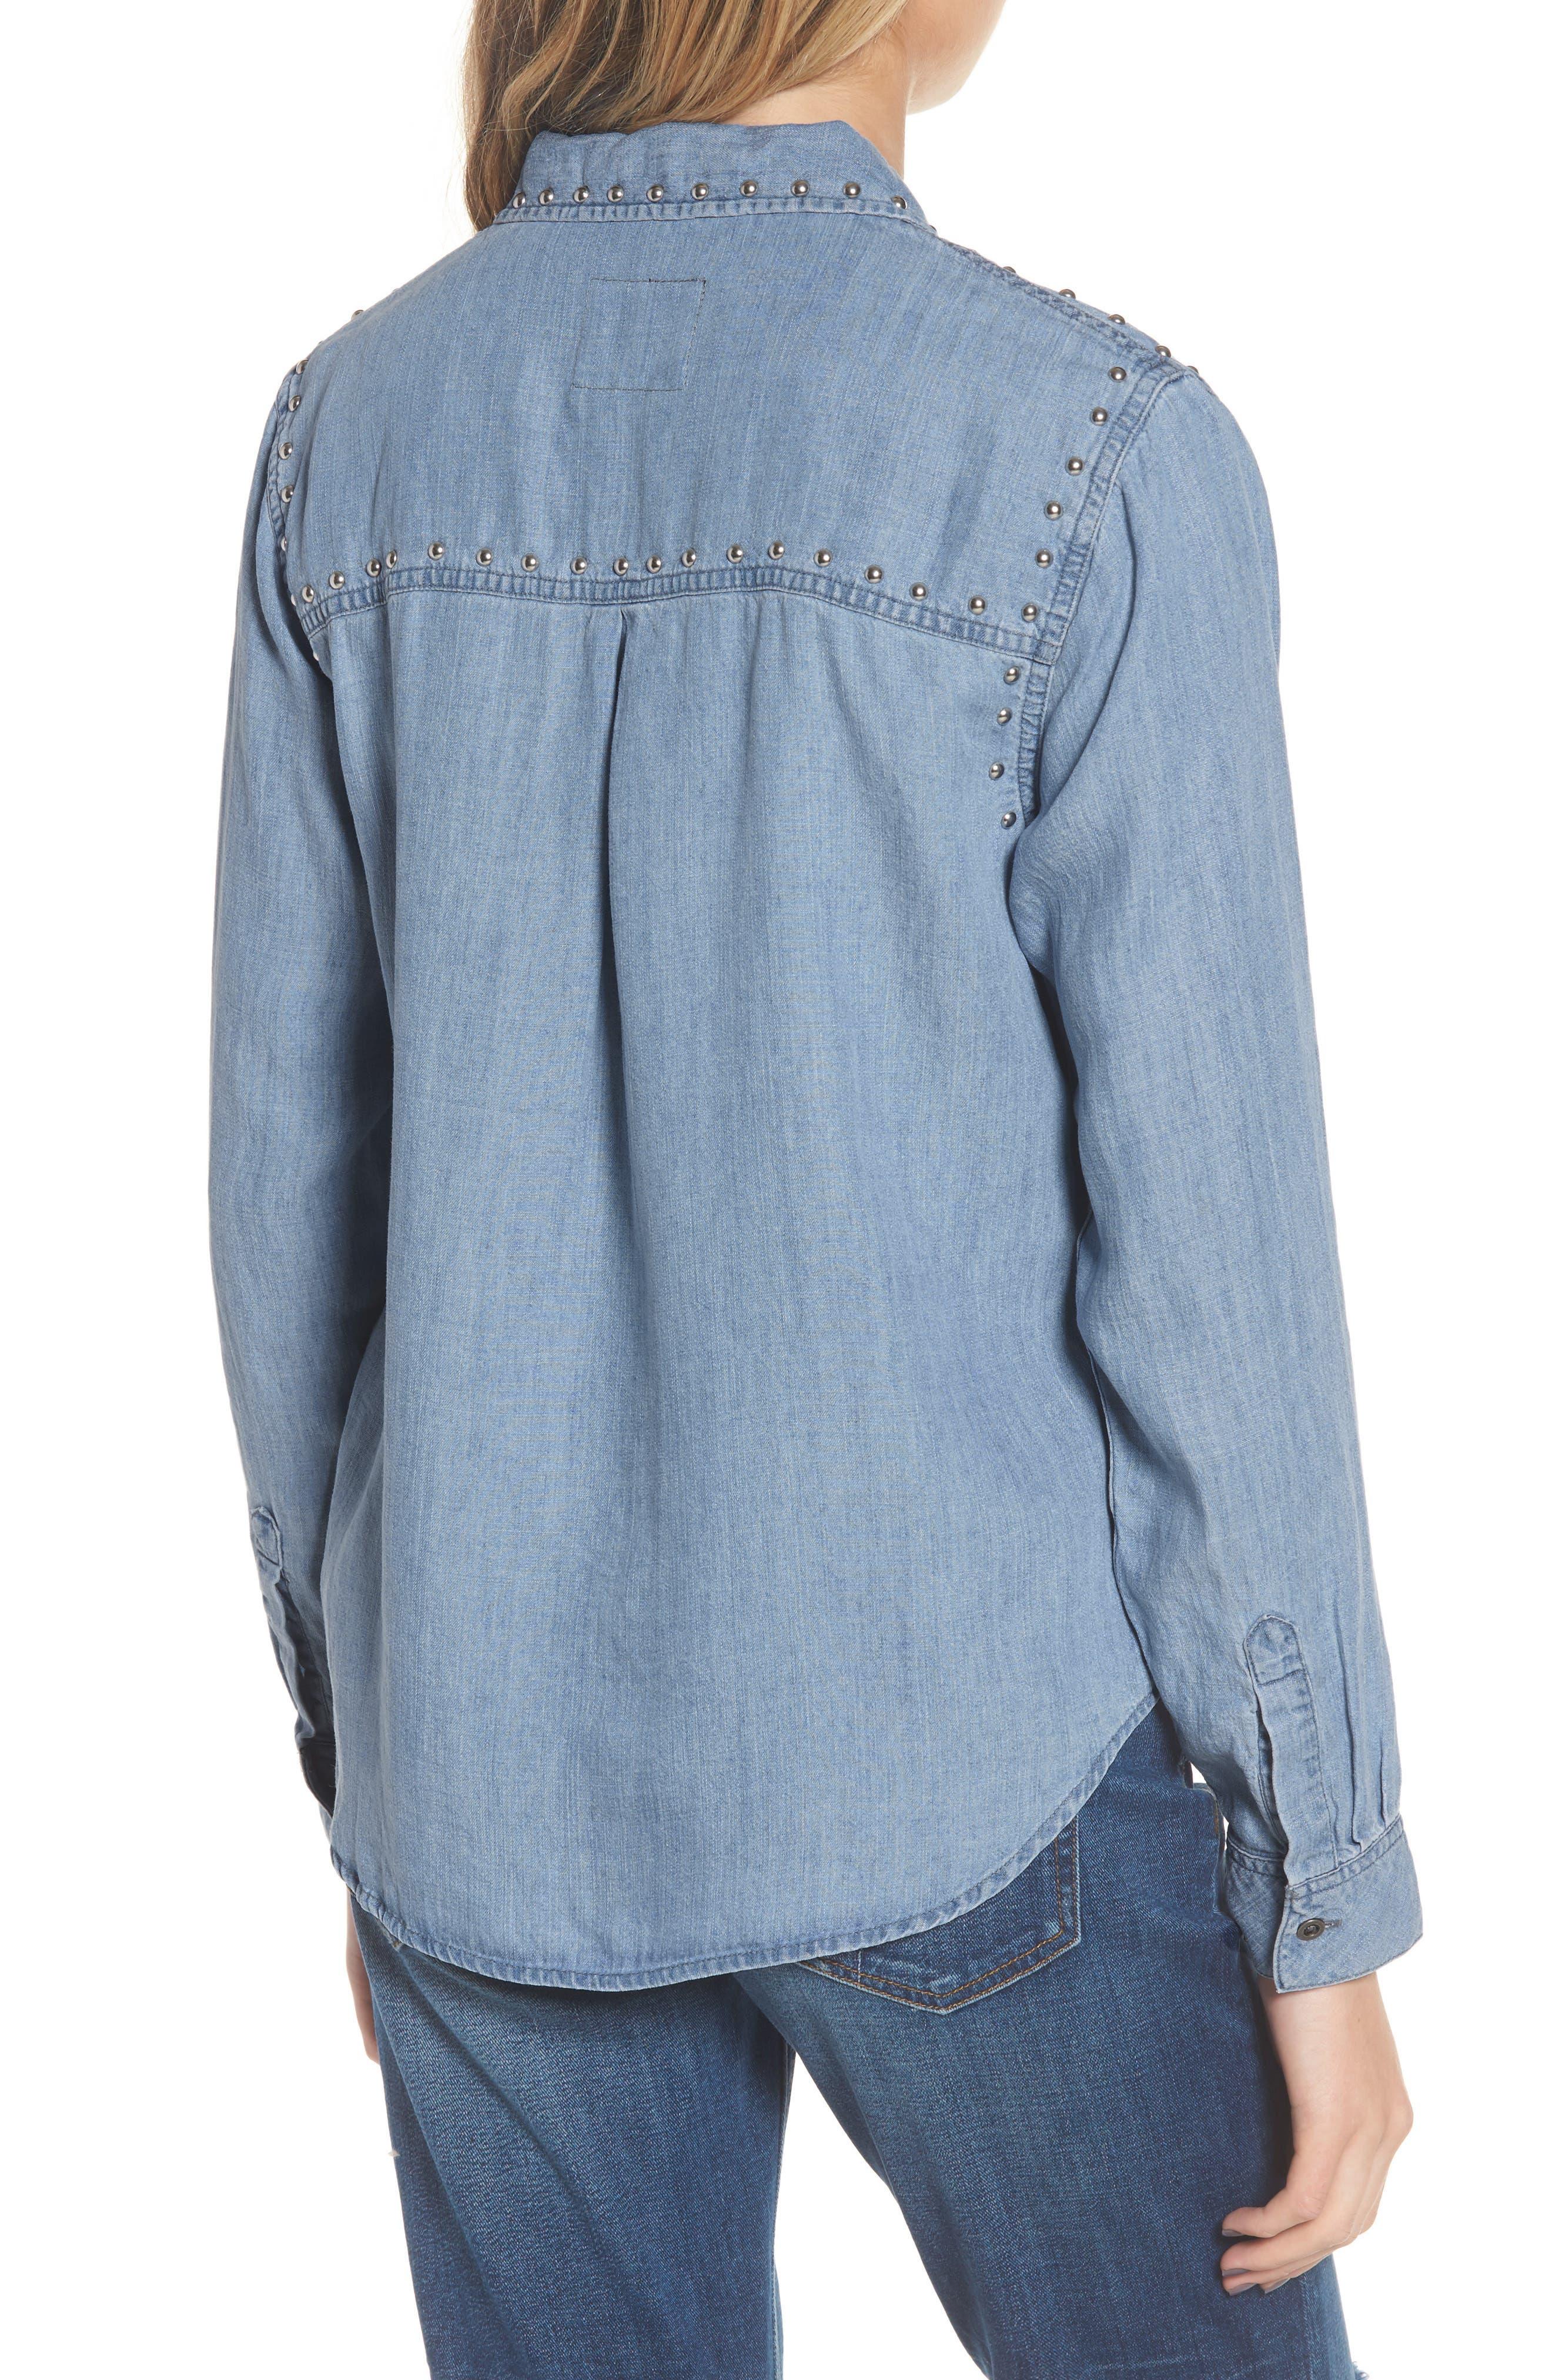 Ingrid Studded Shirt,                             Alternate thumbnail 2, color,                             493